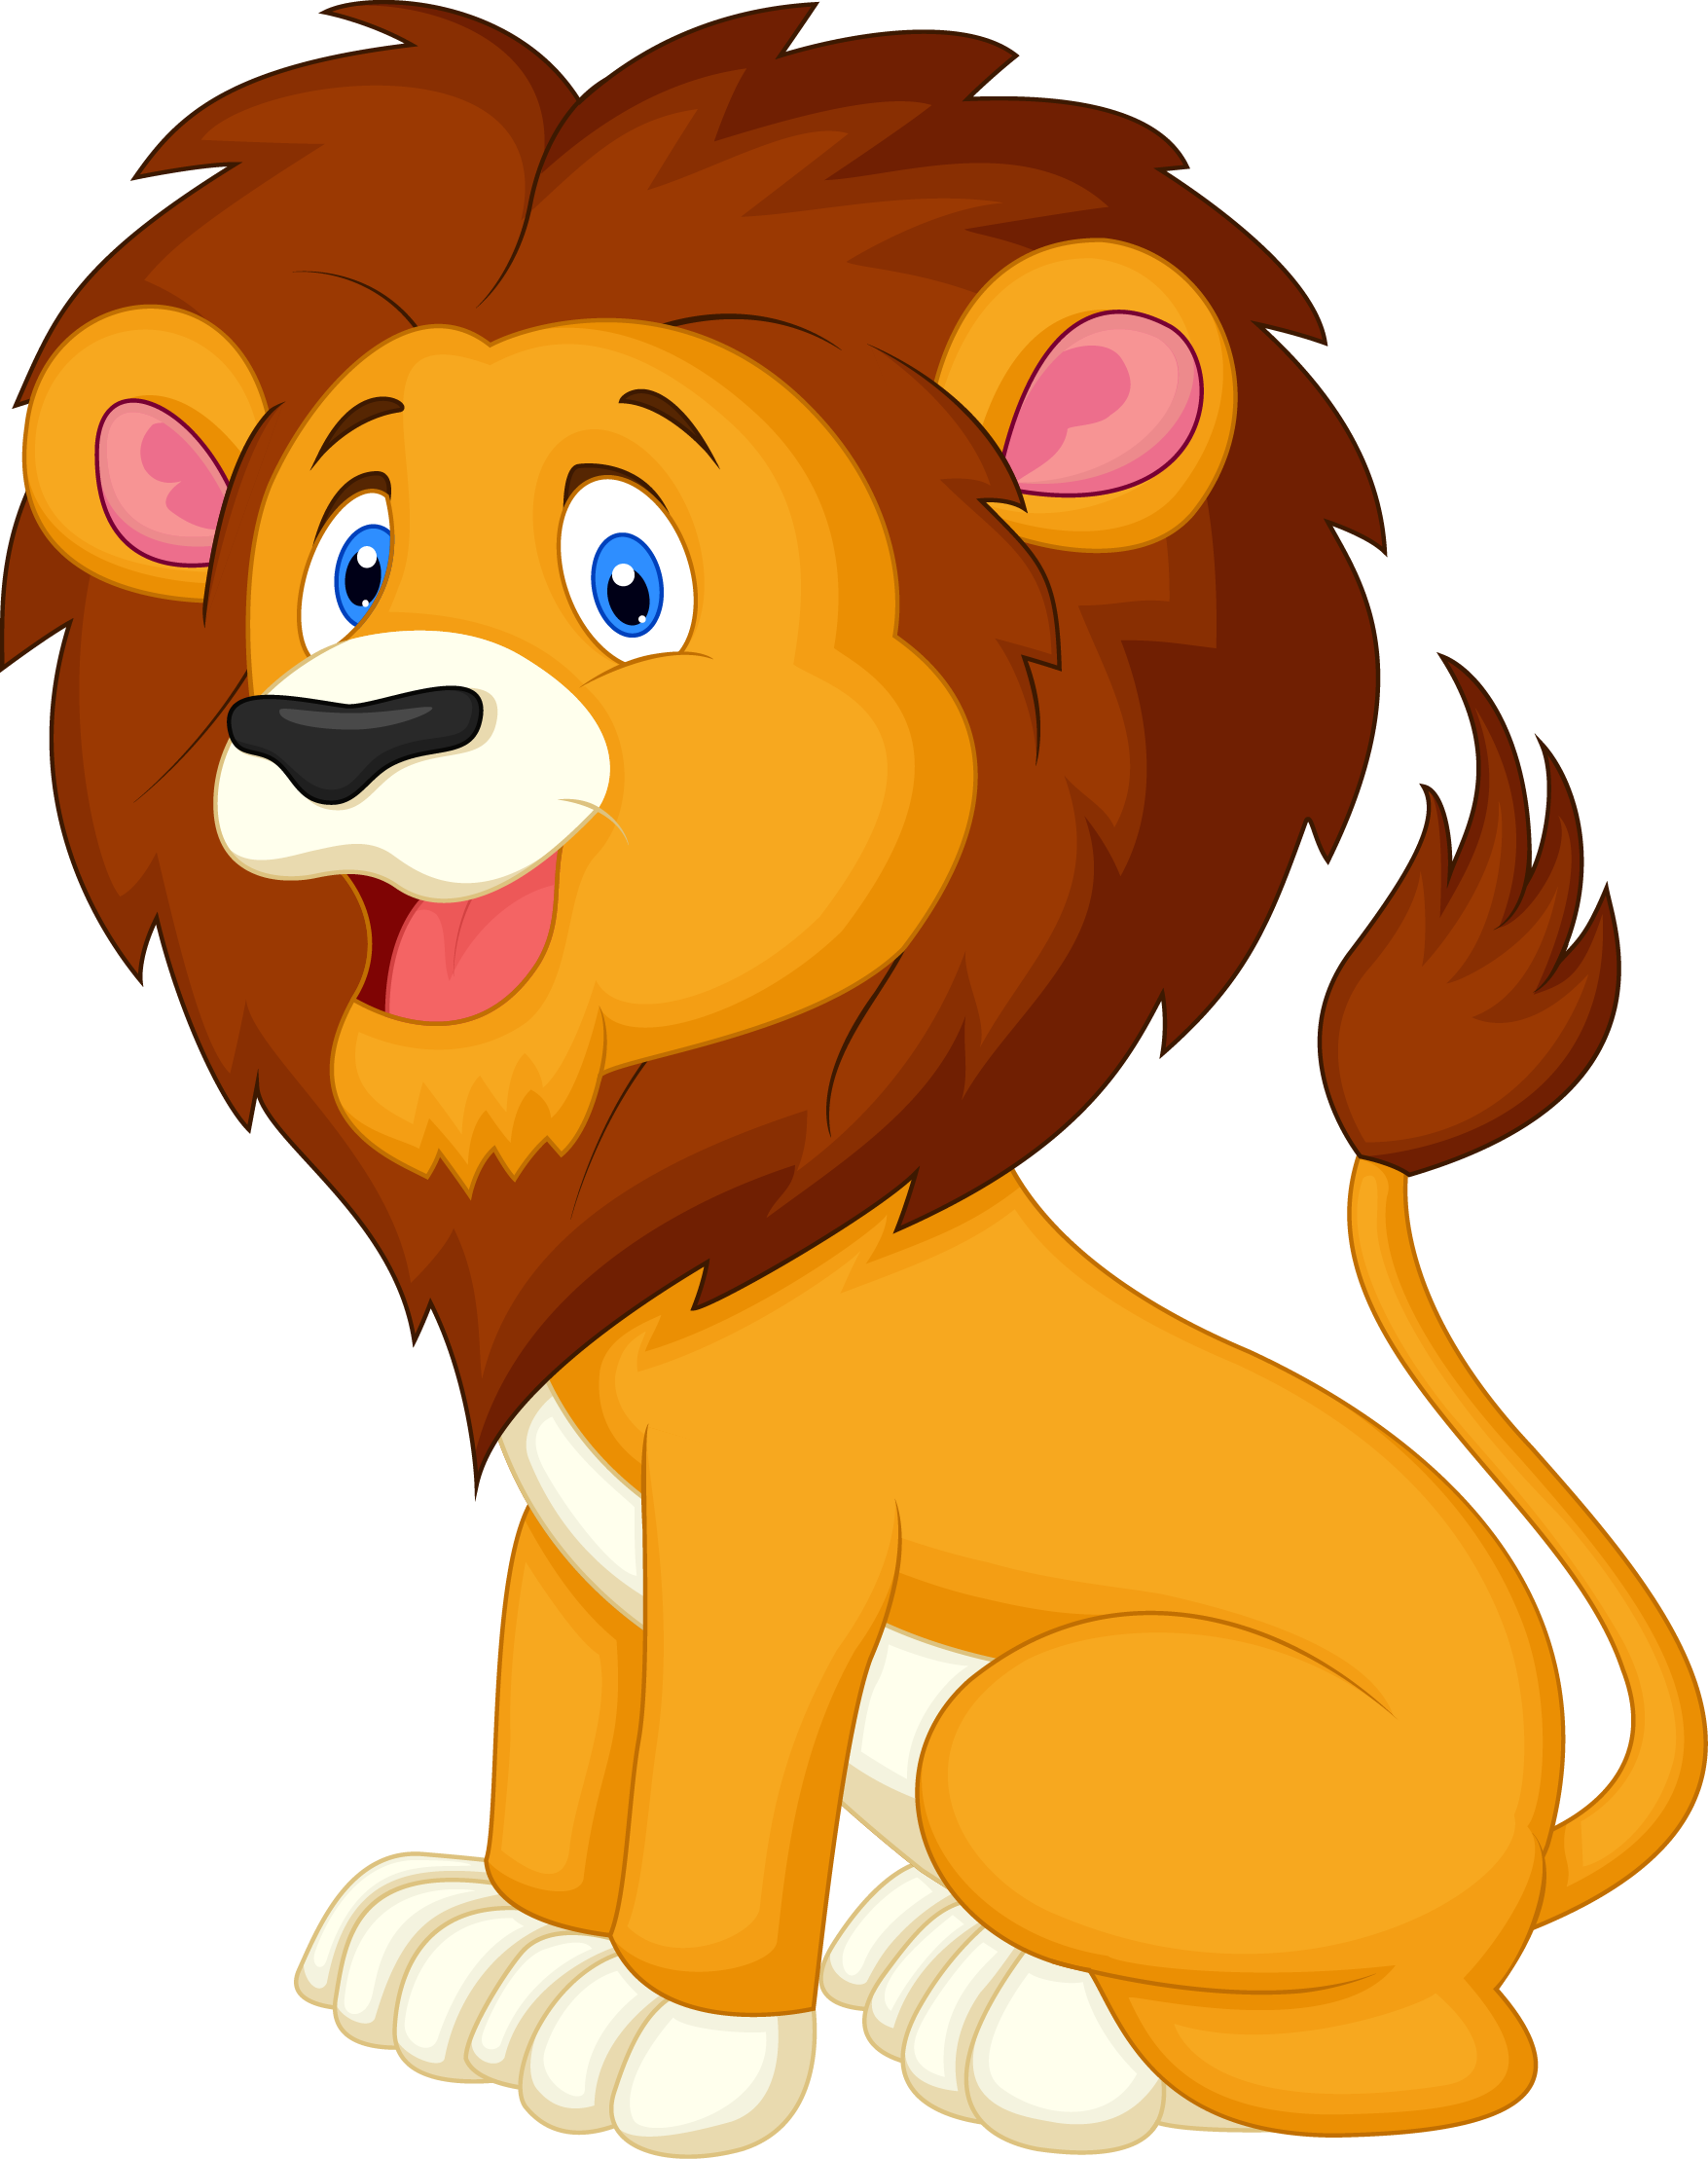 Pin By Karen Miranda On Designs For Baby Lion Cartoon Drawing Cartoon Lion Cute Lion